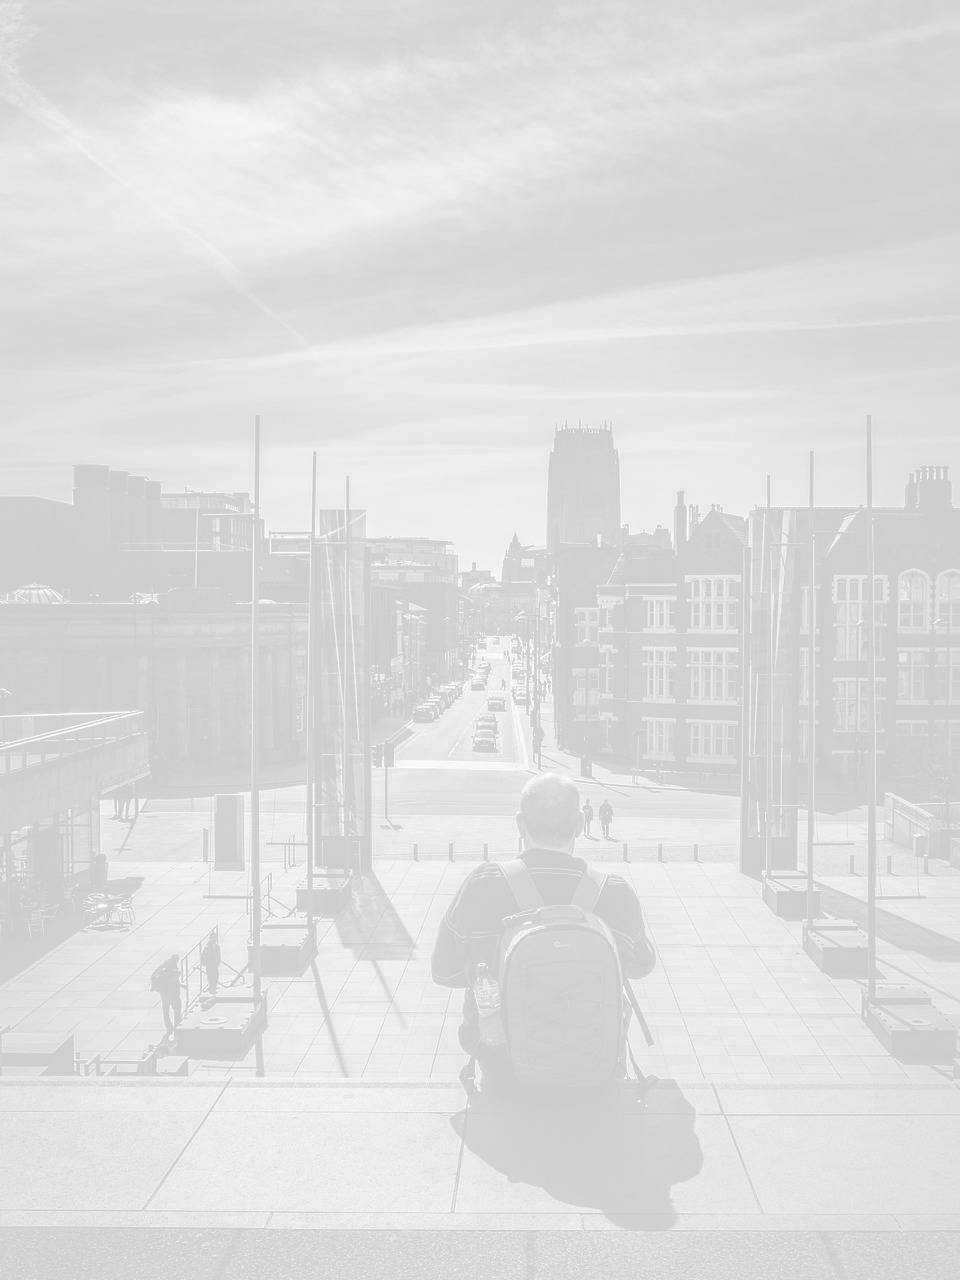 seo liverpool image of liverpool city